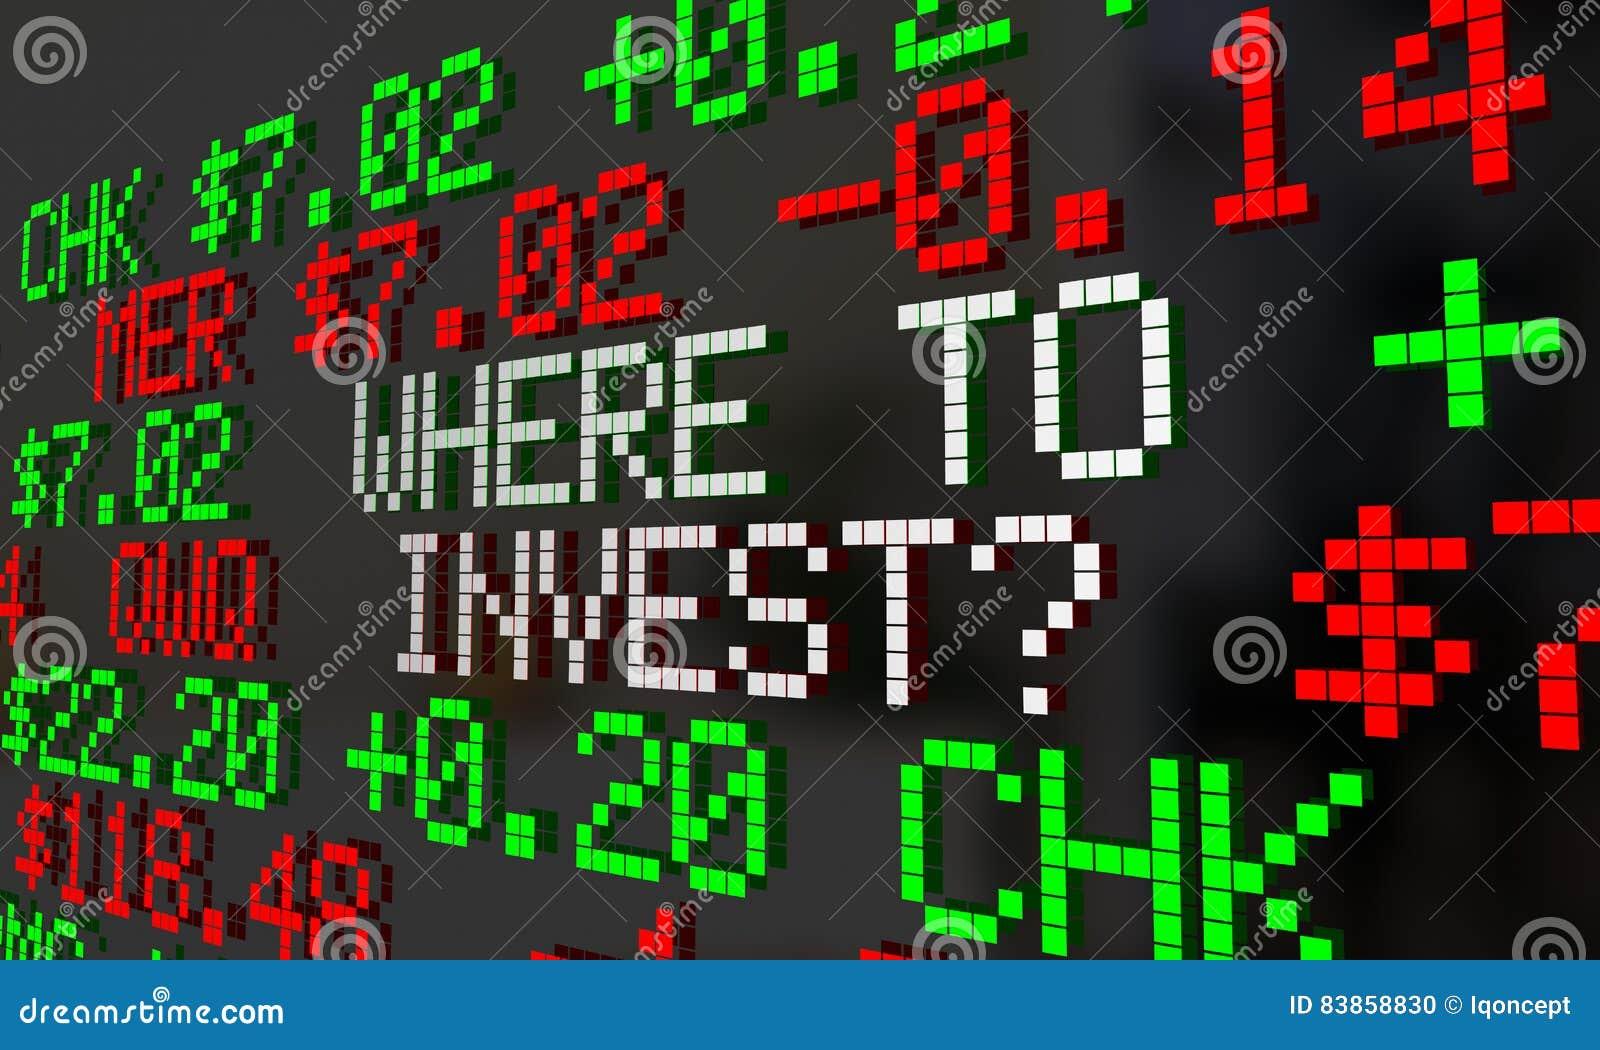 Where To Invest Stock Market Ticker Symbols Stock Illustration